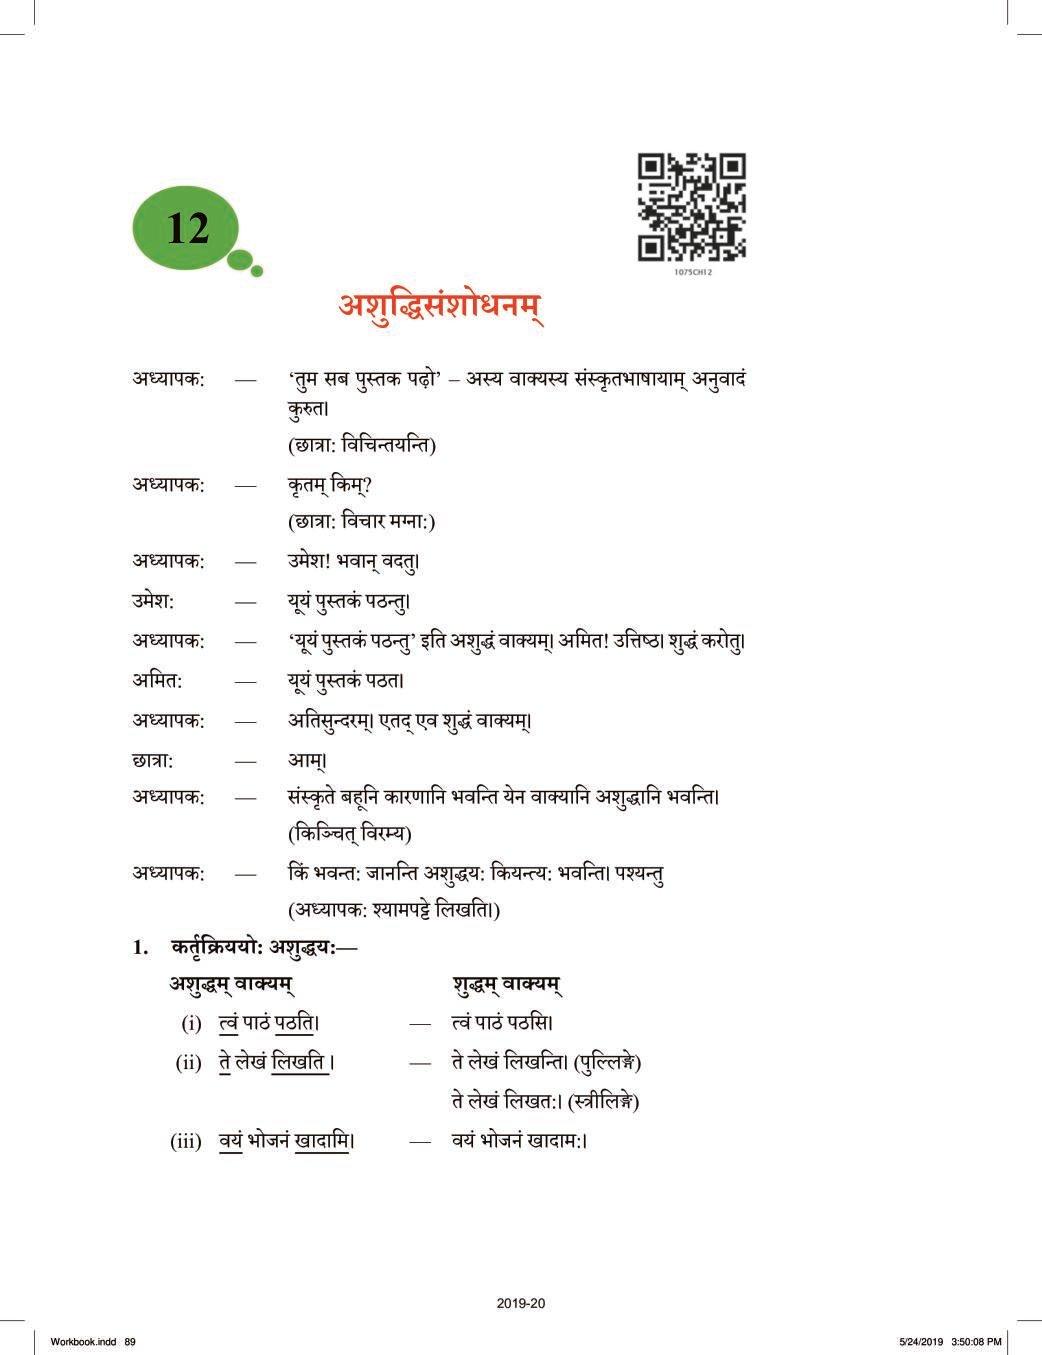 NCERT Book Class 10 Sanskrit (अभ्यासवान् भव) Chapter 12 अशुद्धिसंशोधनम - Page 1